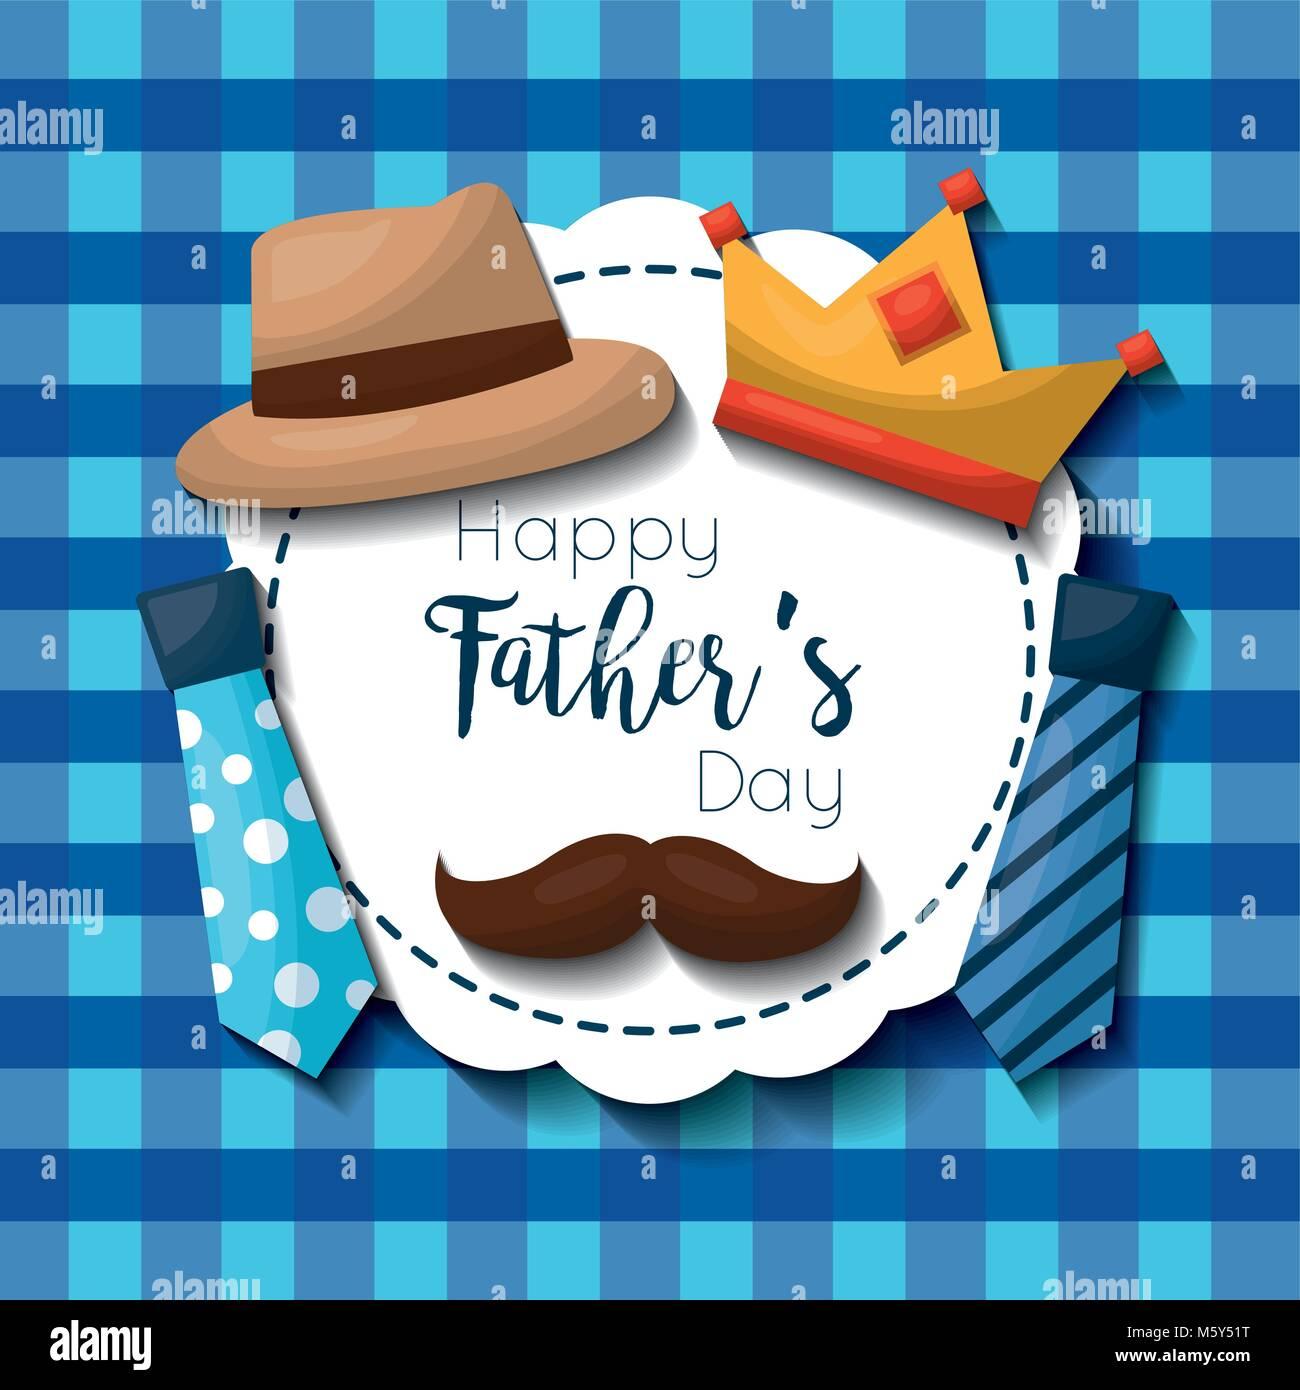 fathers day celebration card - Stock Image